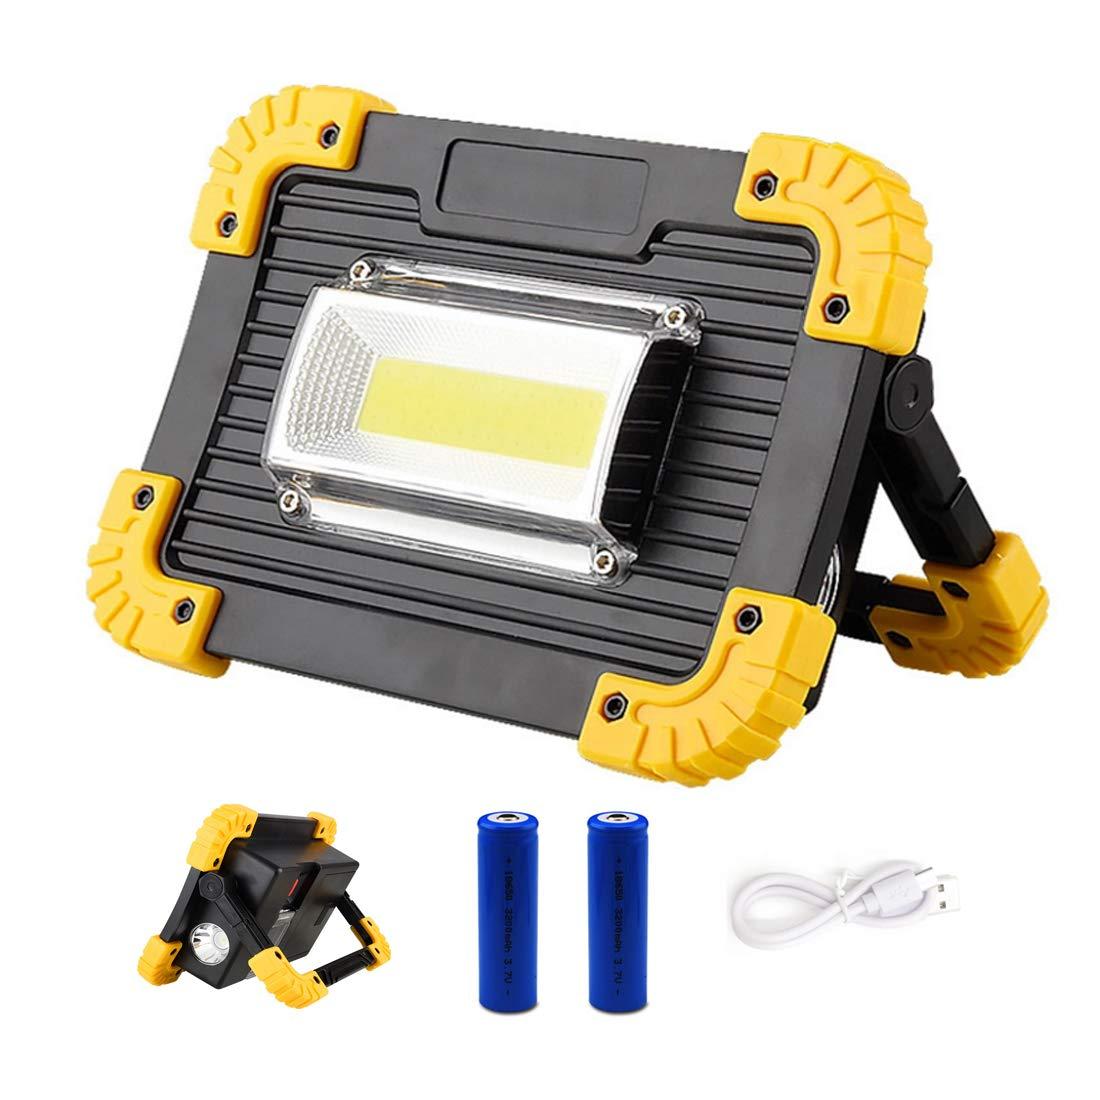 20W COB Bright Light – Working Light Portable